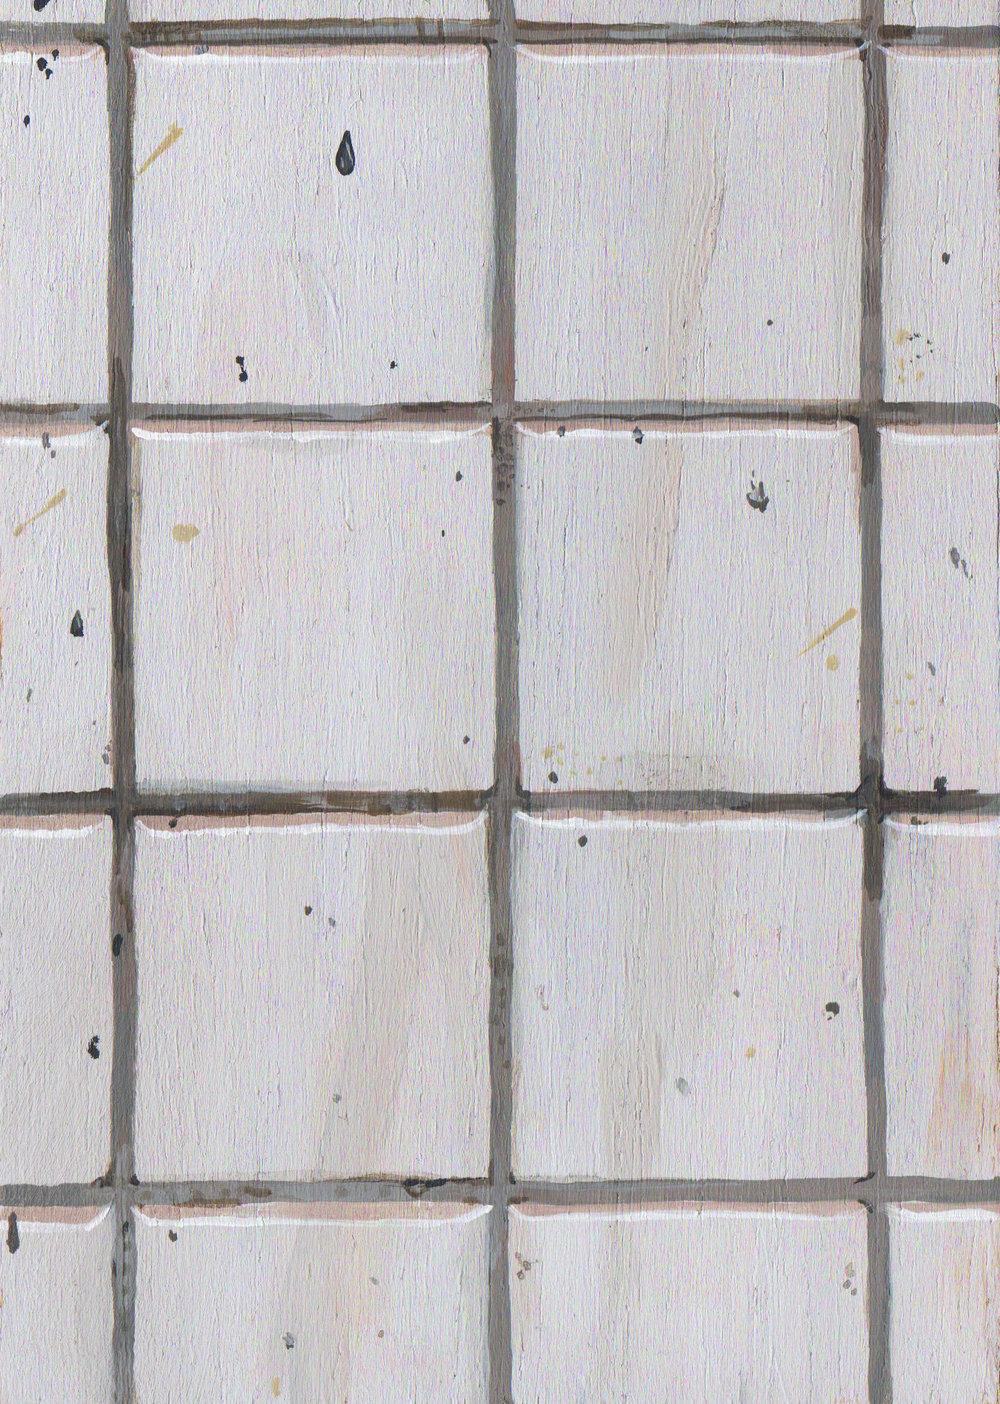 Karten_3-12x16cm-acylic-on-wood.jpg